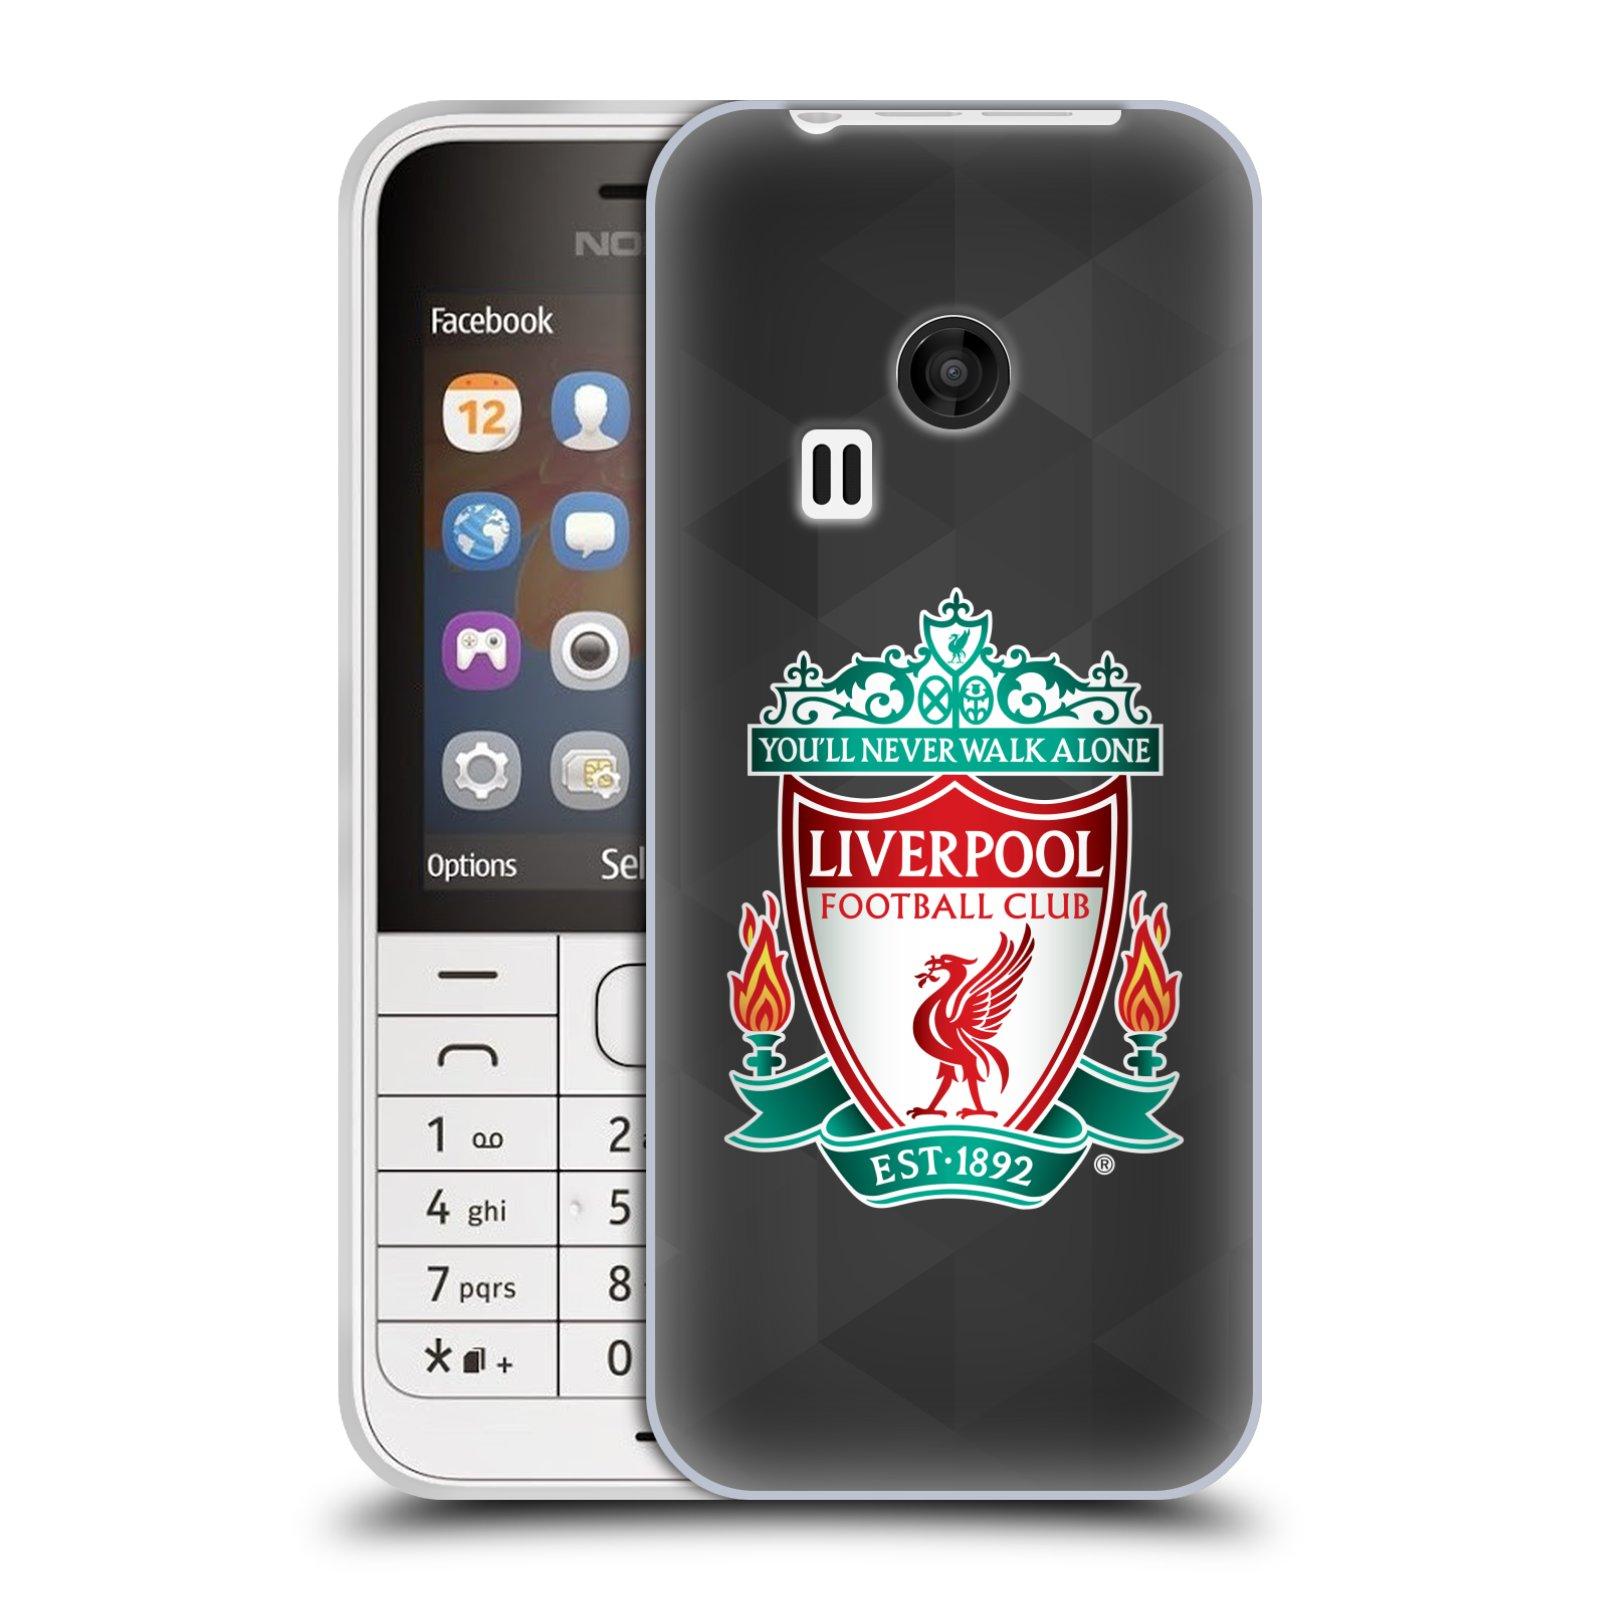 Silikonové pouzdro na mobil Nokia 220 HEAD CASE ZNAK LIVERPOOL FC OFFICIAL GEOMETRIC BLACK (Silikonový kryt či obal na mobilní telefon Liverpool FC Official pro Nokia 220 a 220 Dual SIM)